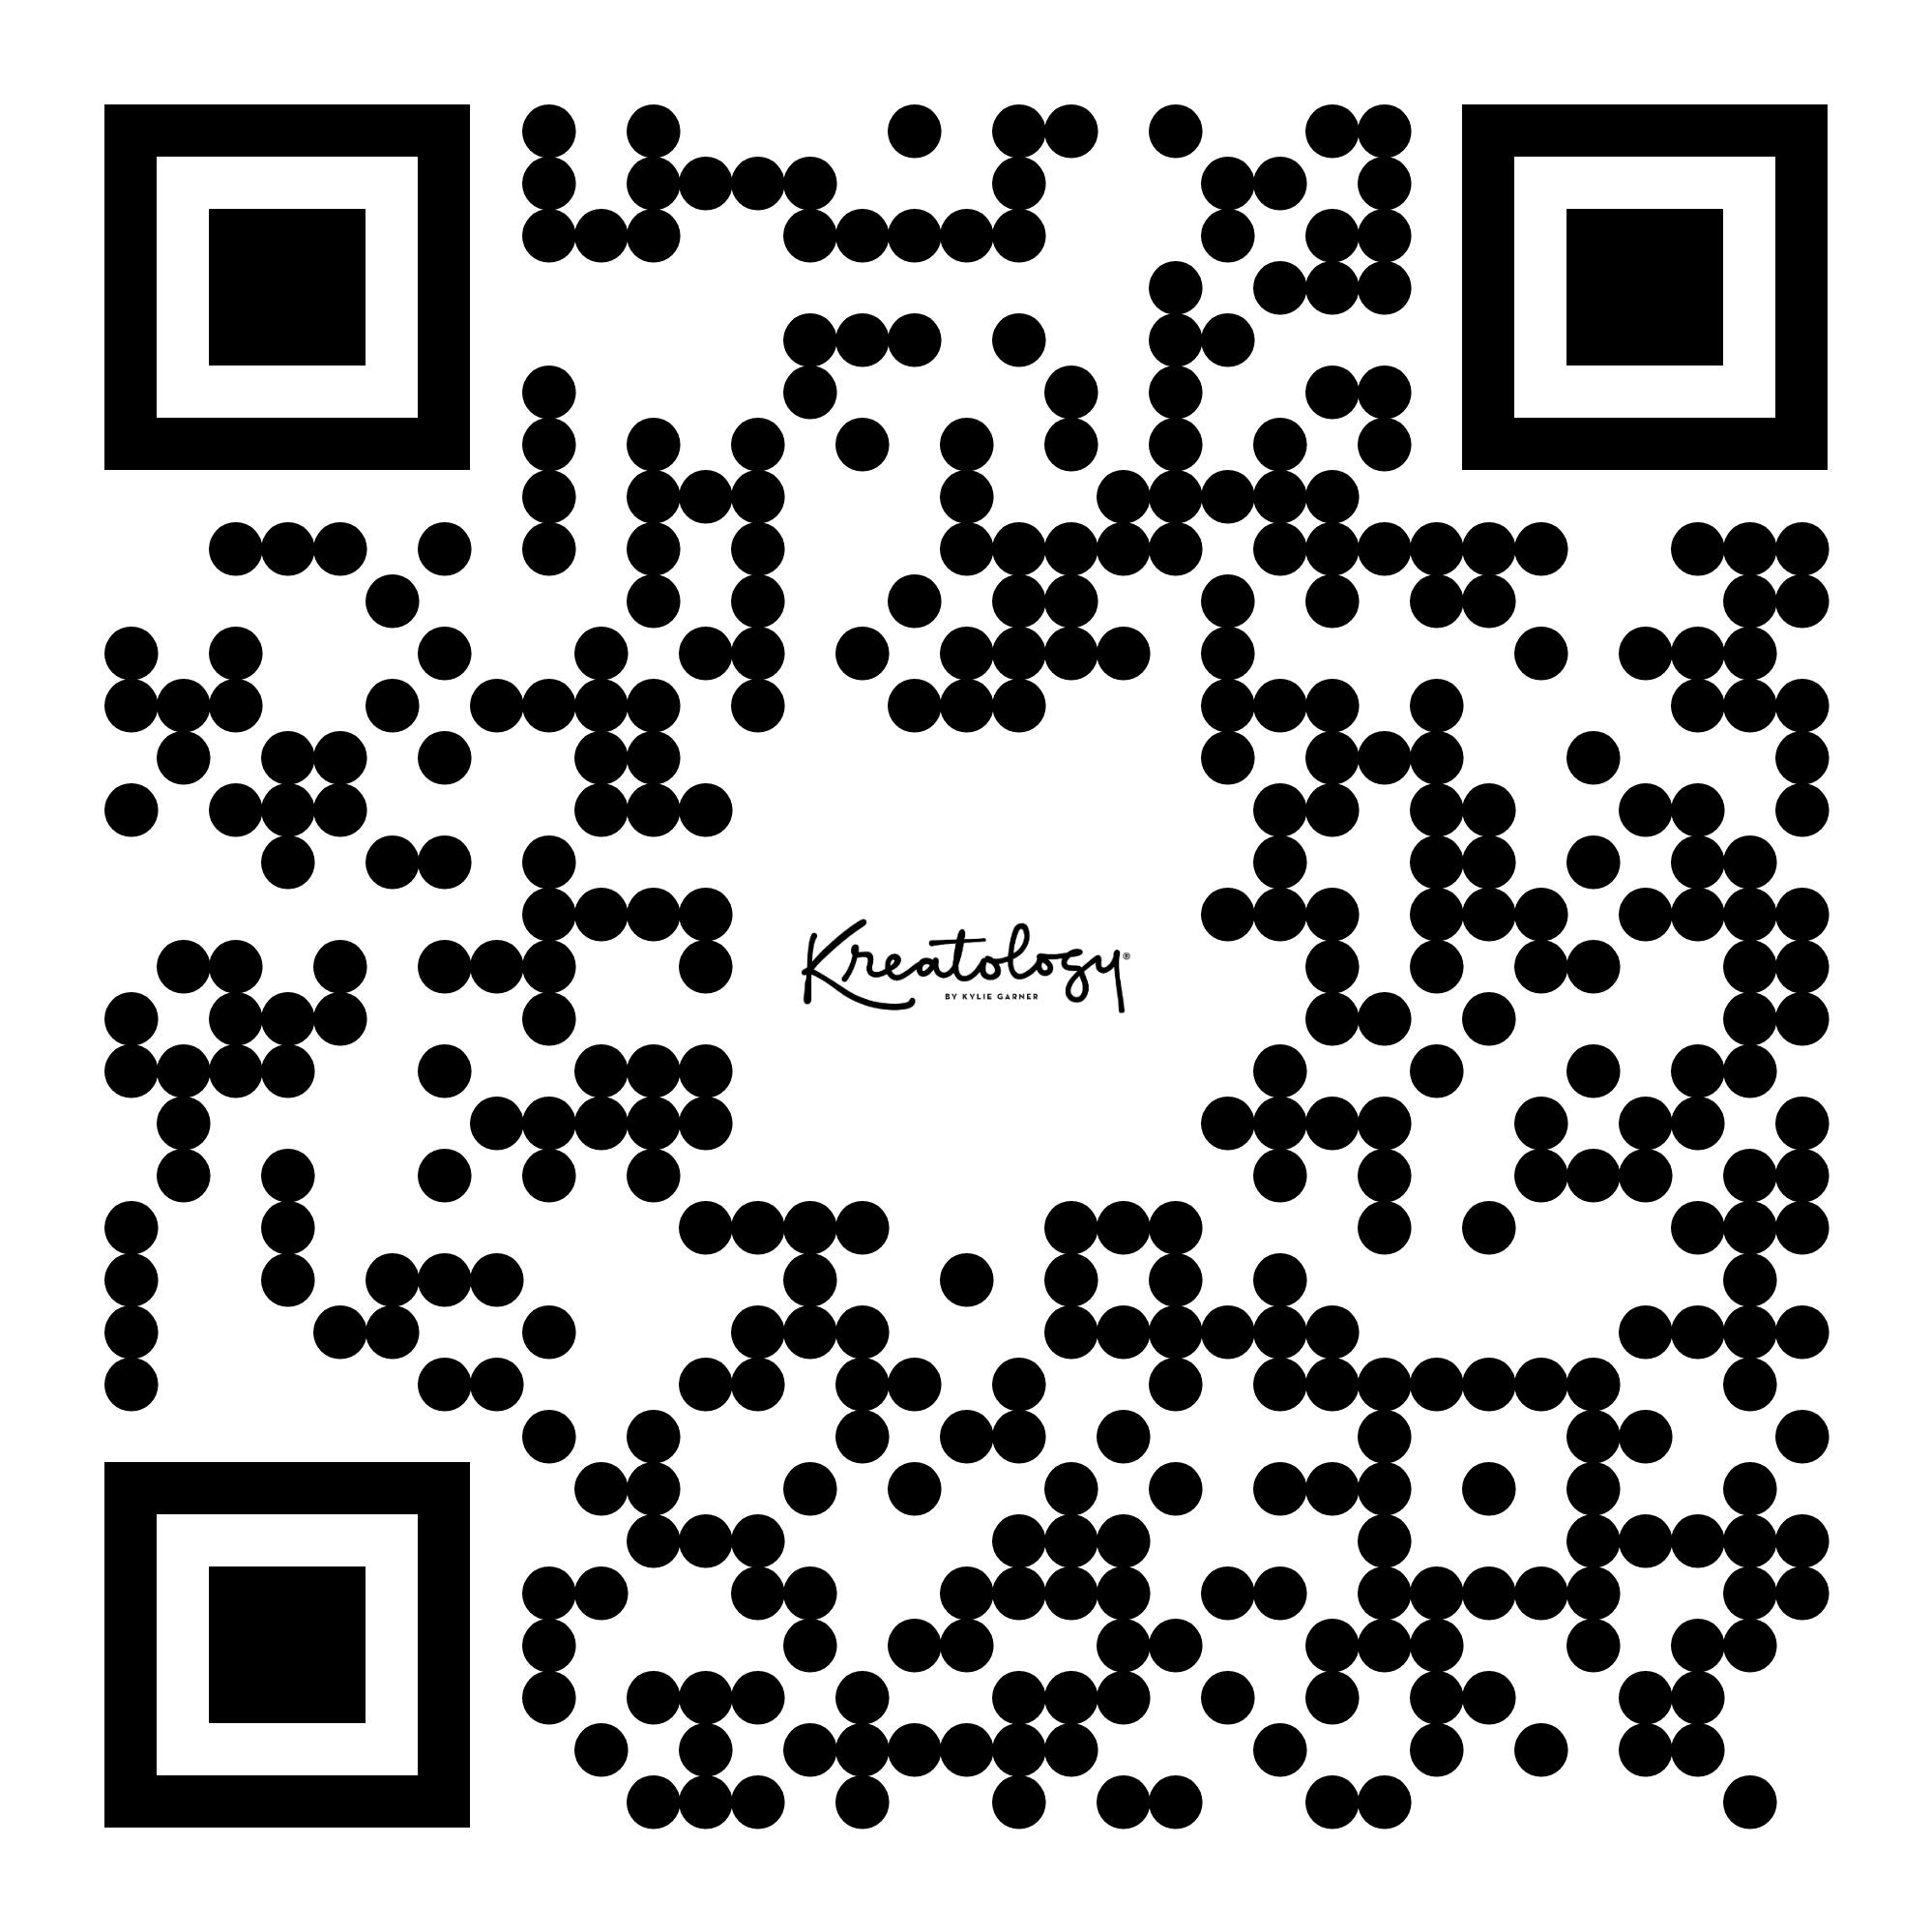 QR Code Generator. Create your own QR Code!